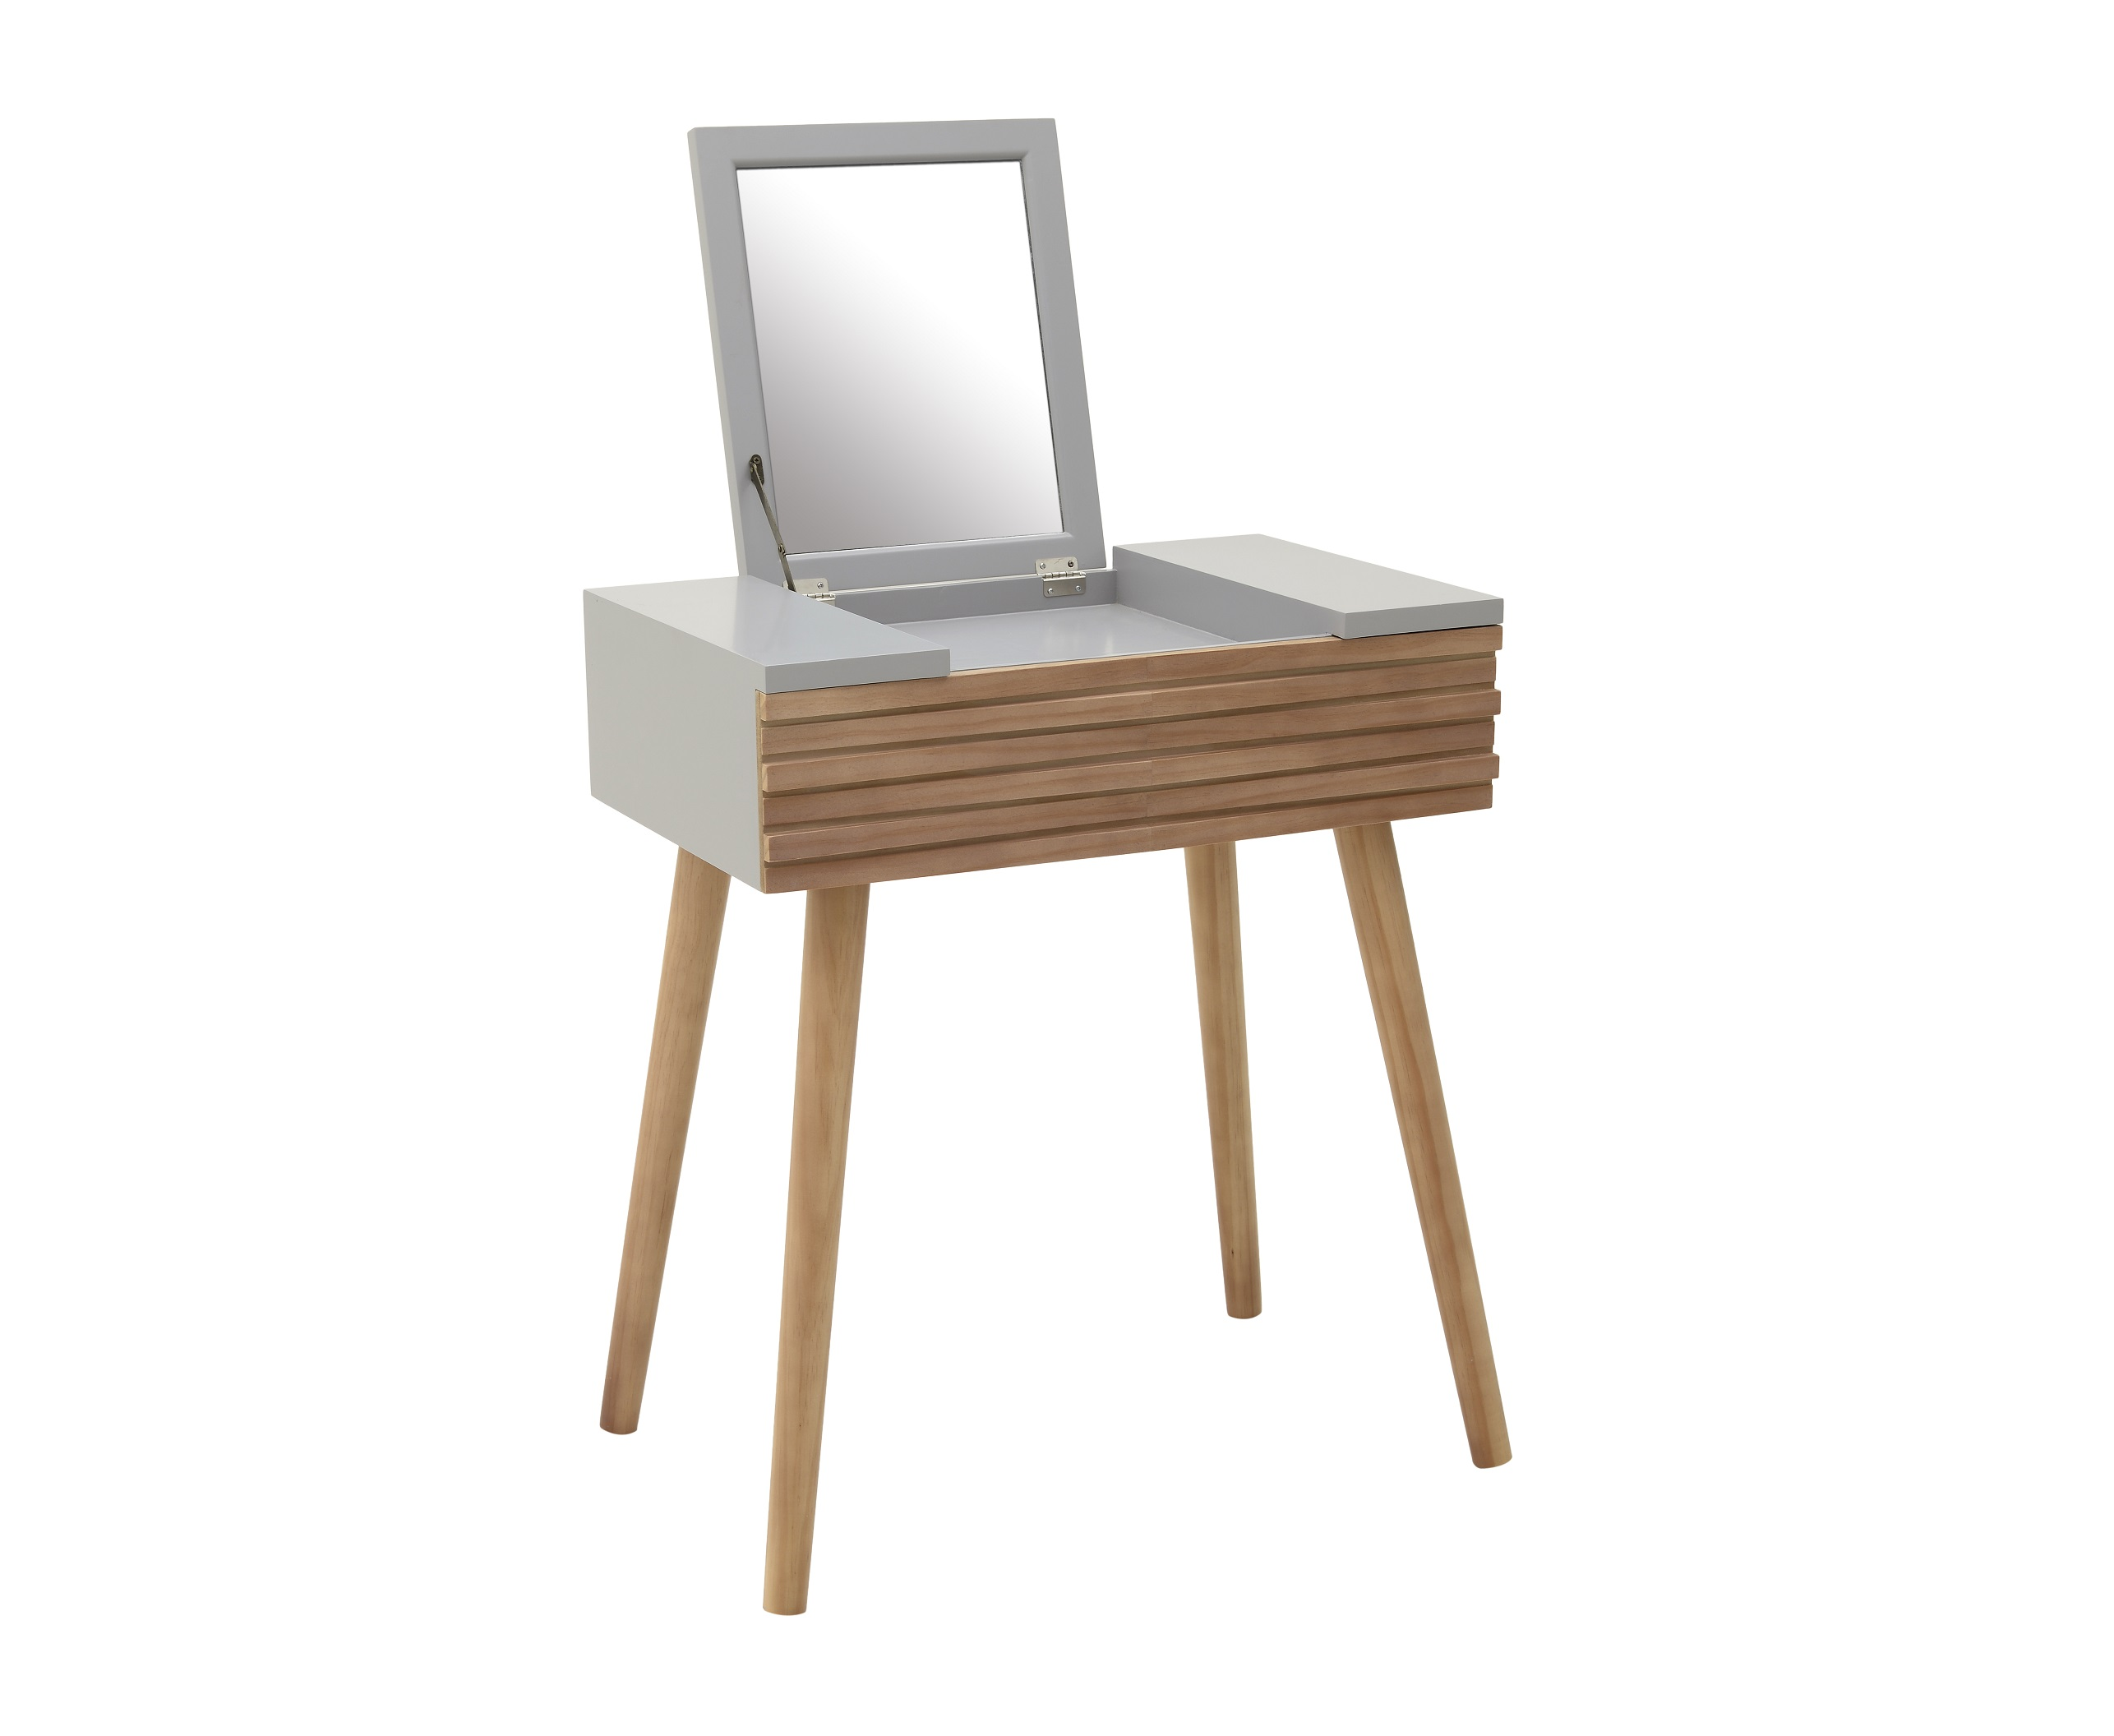 Будуарный стол LudvikaТуалетные столики<br><br><br>Material: Дерево<br>Length см: None<br>Width см: 64<br>Depth см: 40<br>Height см: 115